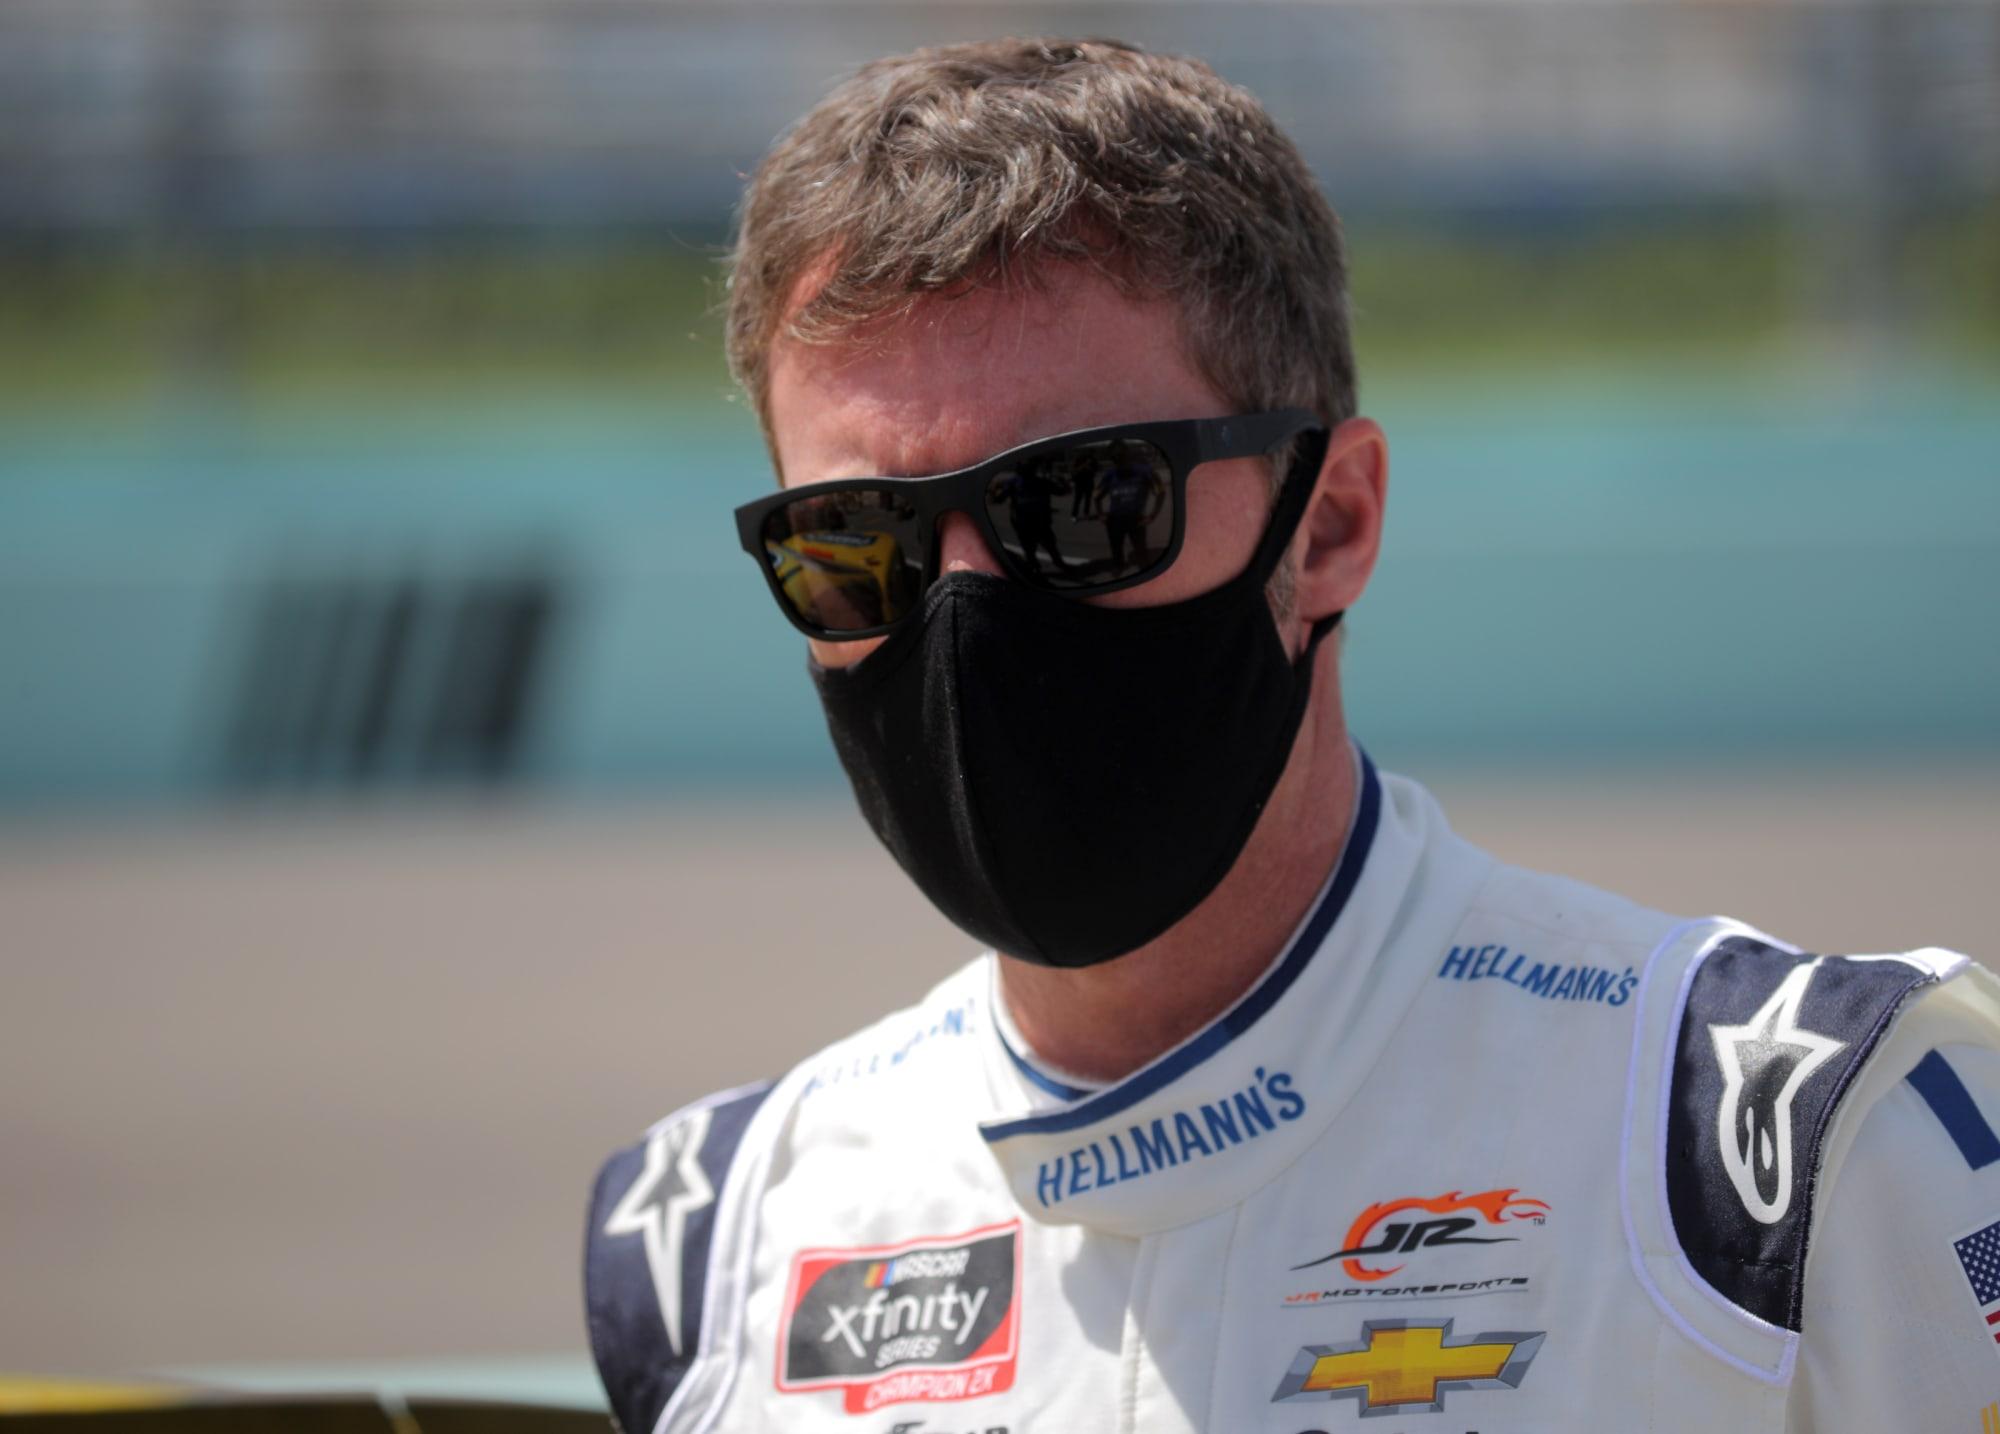 NASCAR: Dale Earnhardt Jr.'s decision may end 46-year streak